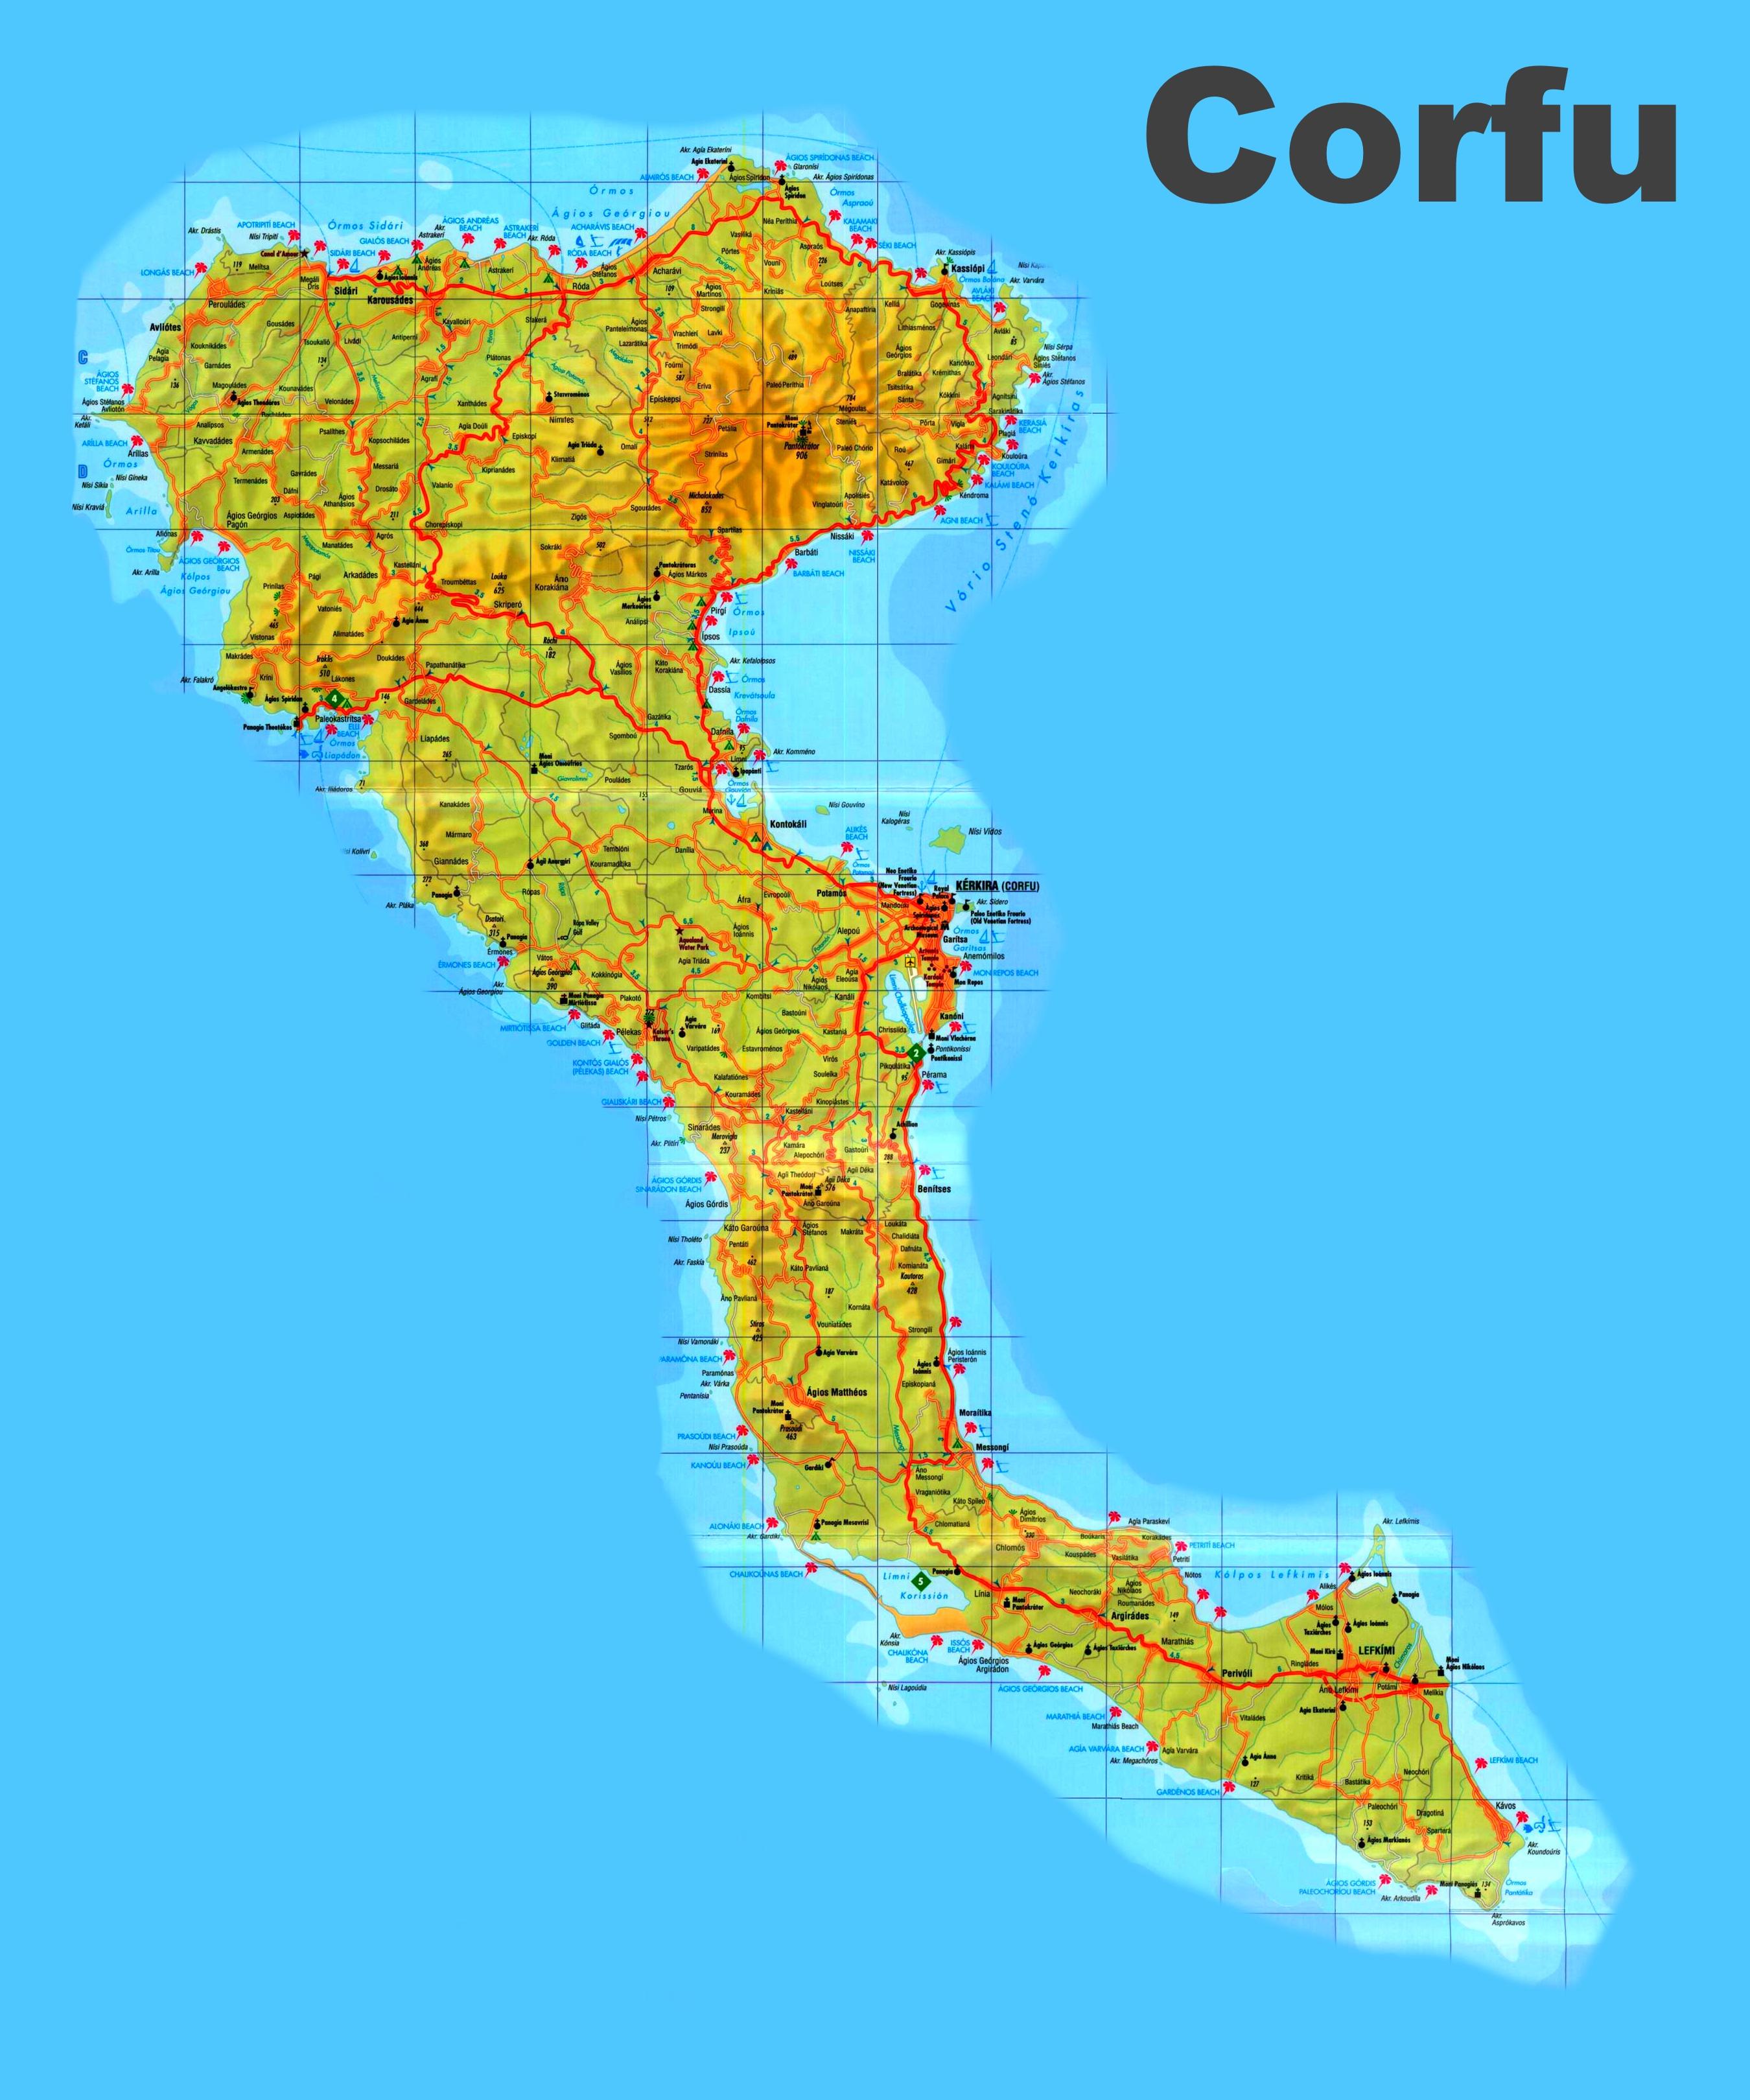 Corfu sightseeing map